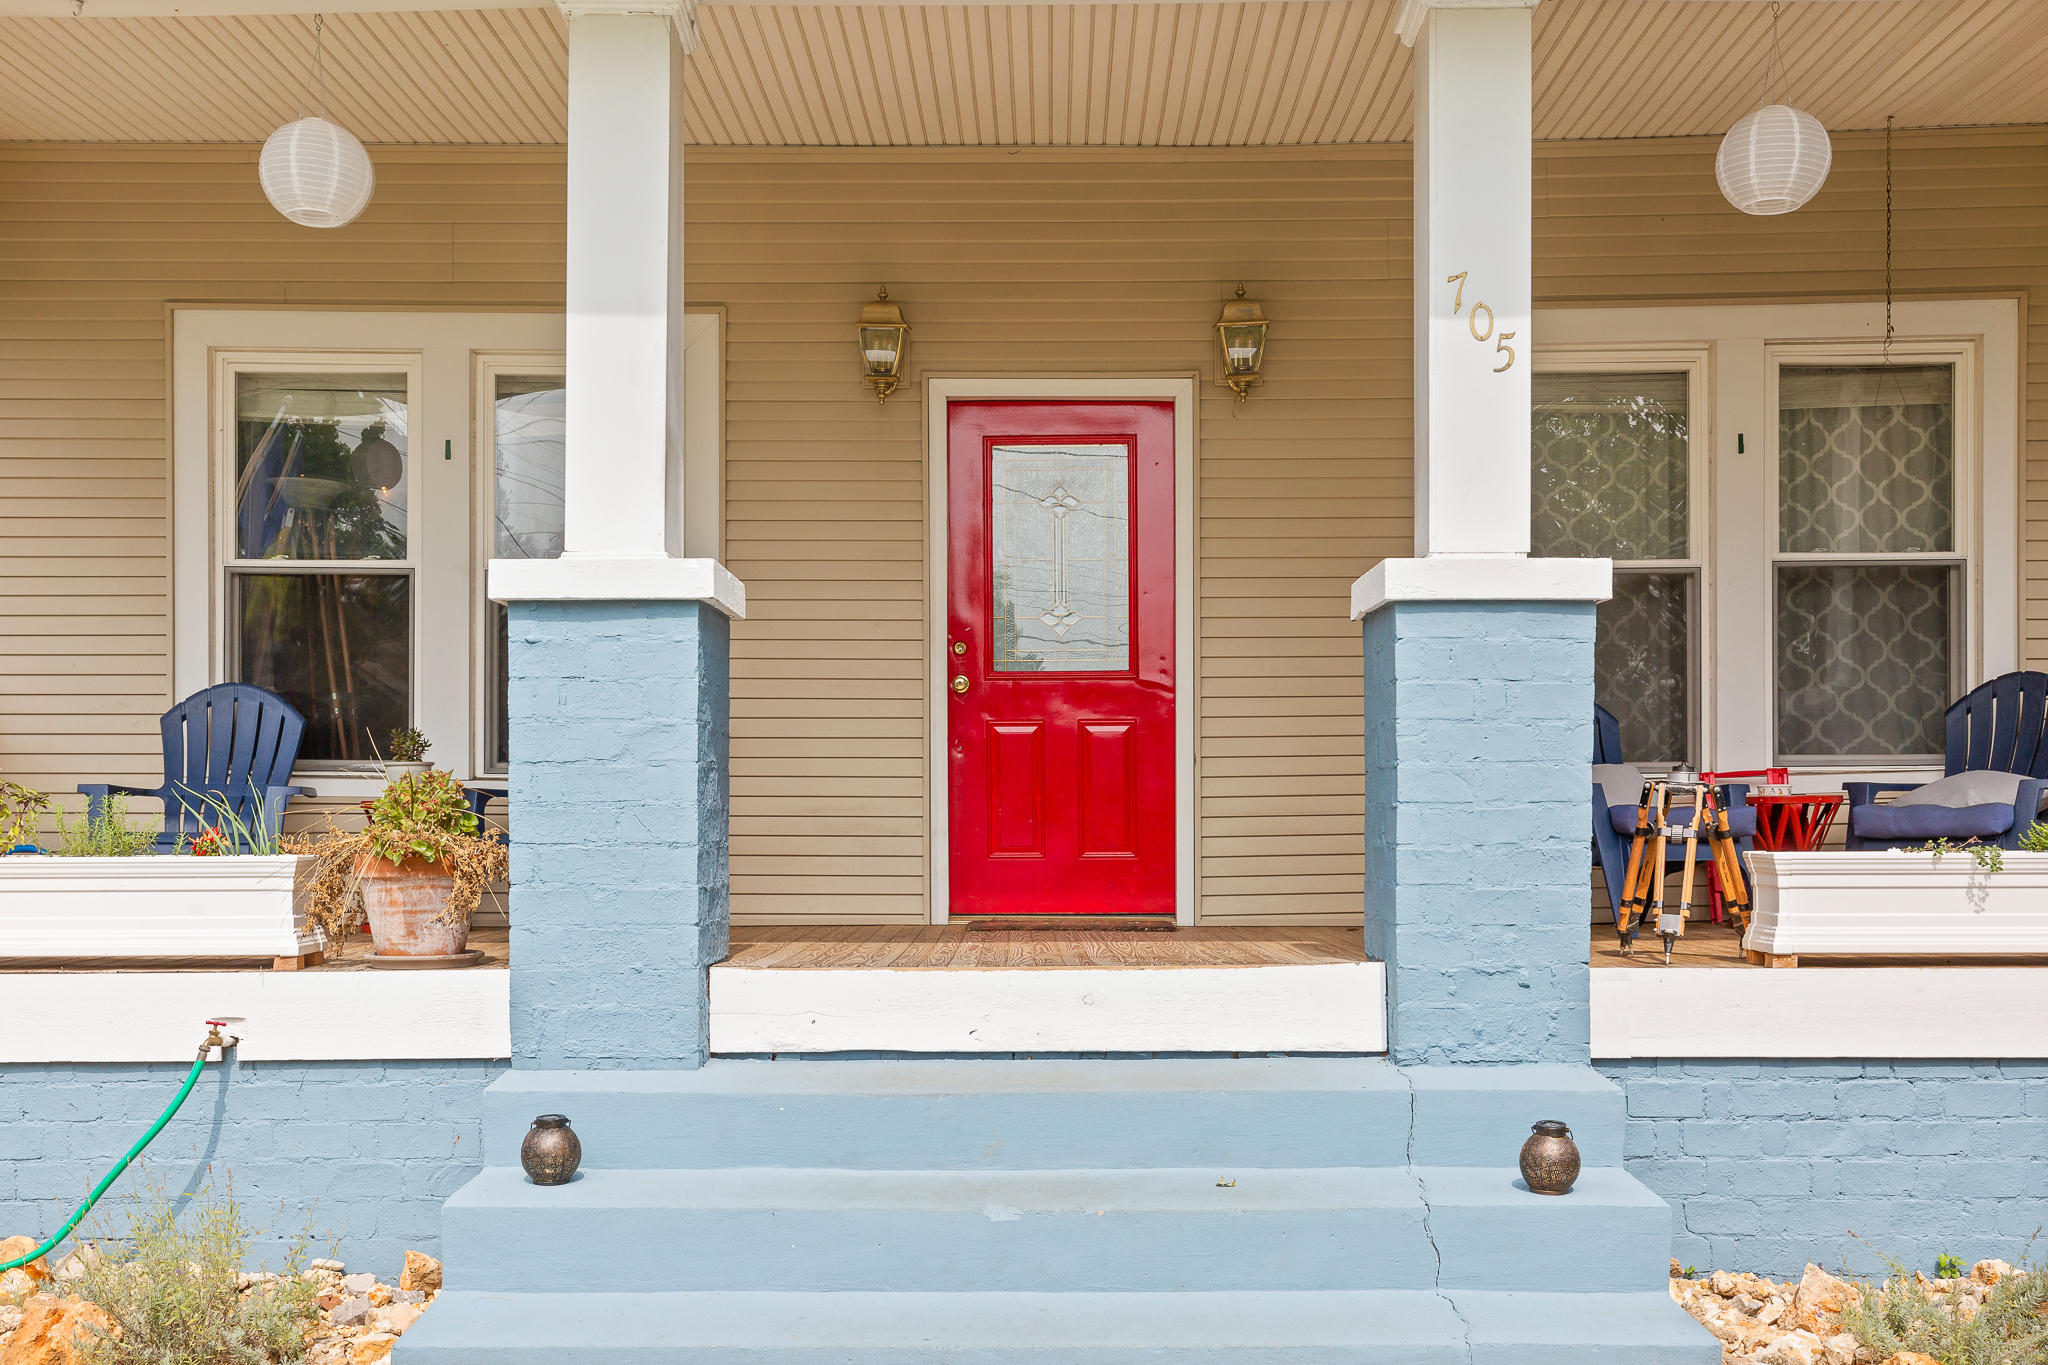 705 Barton Ave, Chattanooga, TN 37405